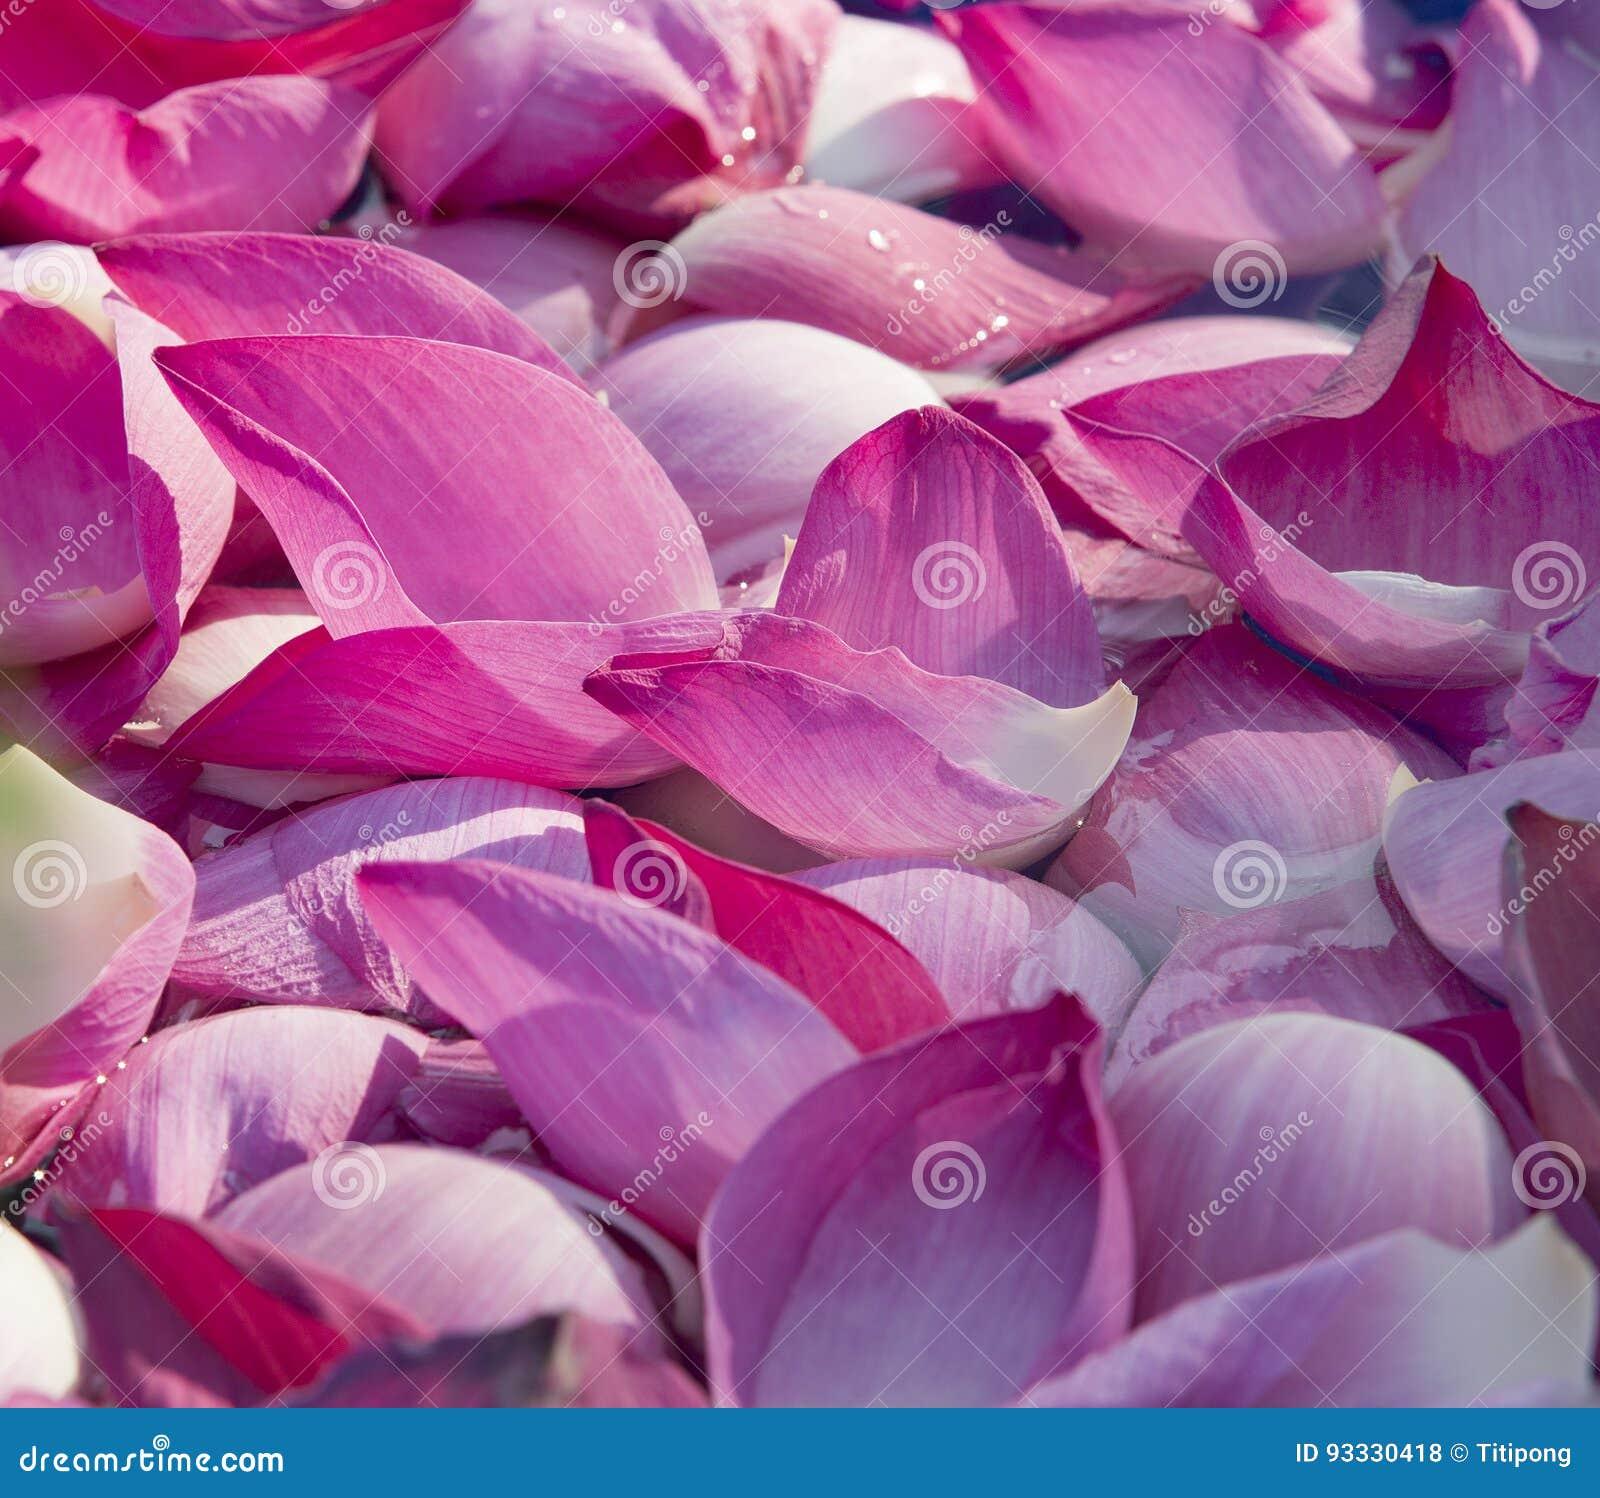 Beautiful Lotus Flower At The Wedding Stock Photo Image Of